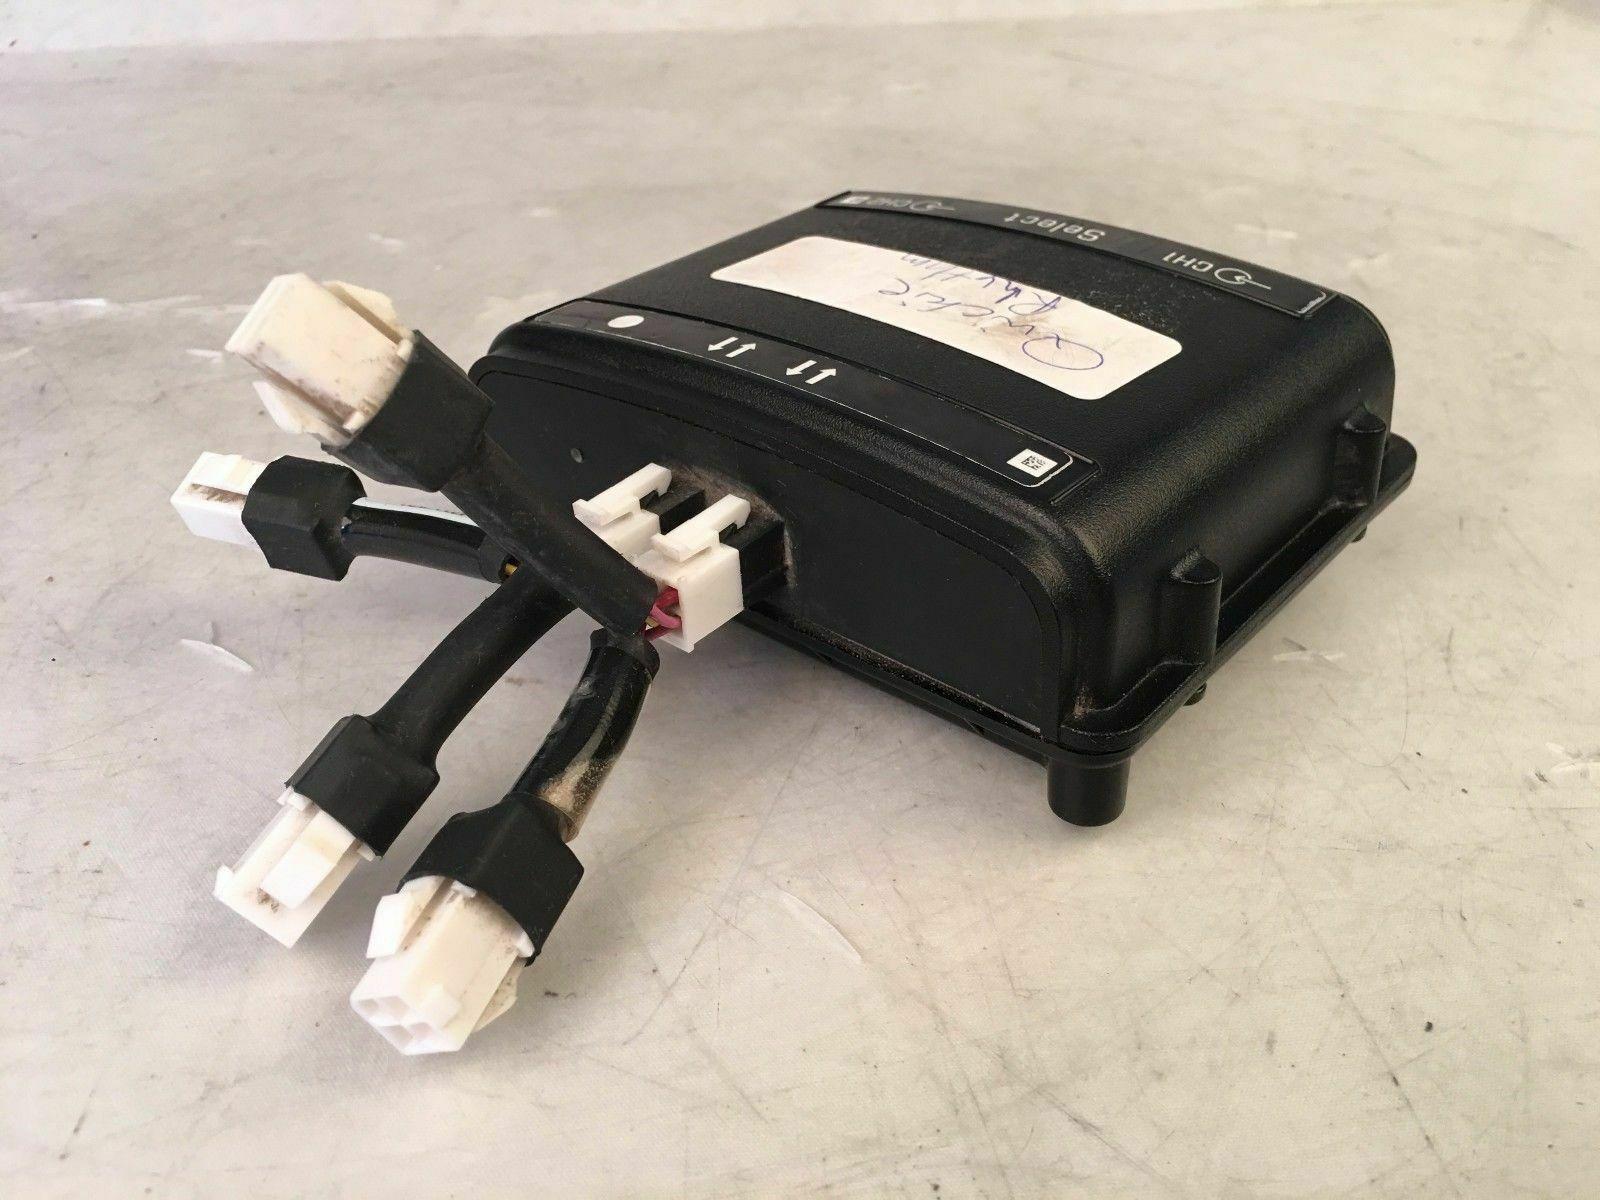 Sunrise Medical - Delphi - QR-ECM Switch Module - for Power Wheelchairs image 3